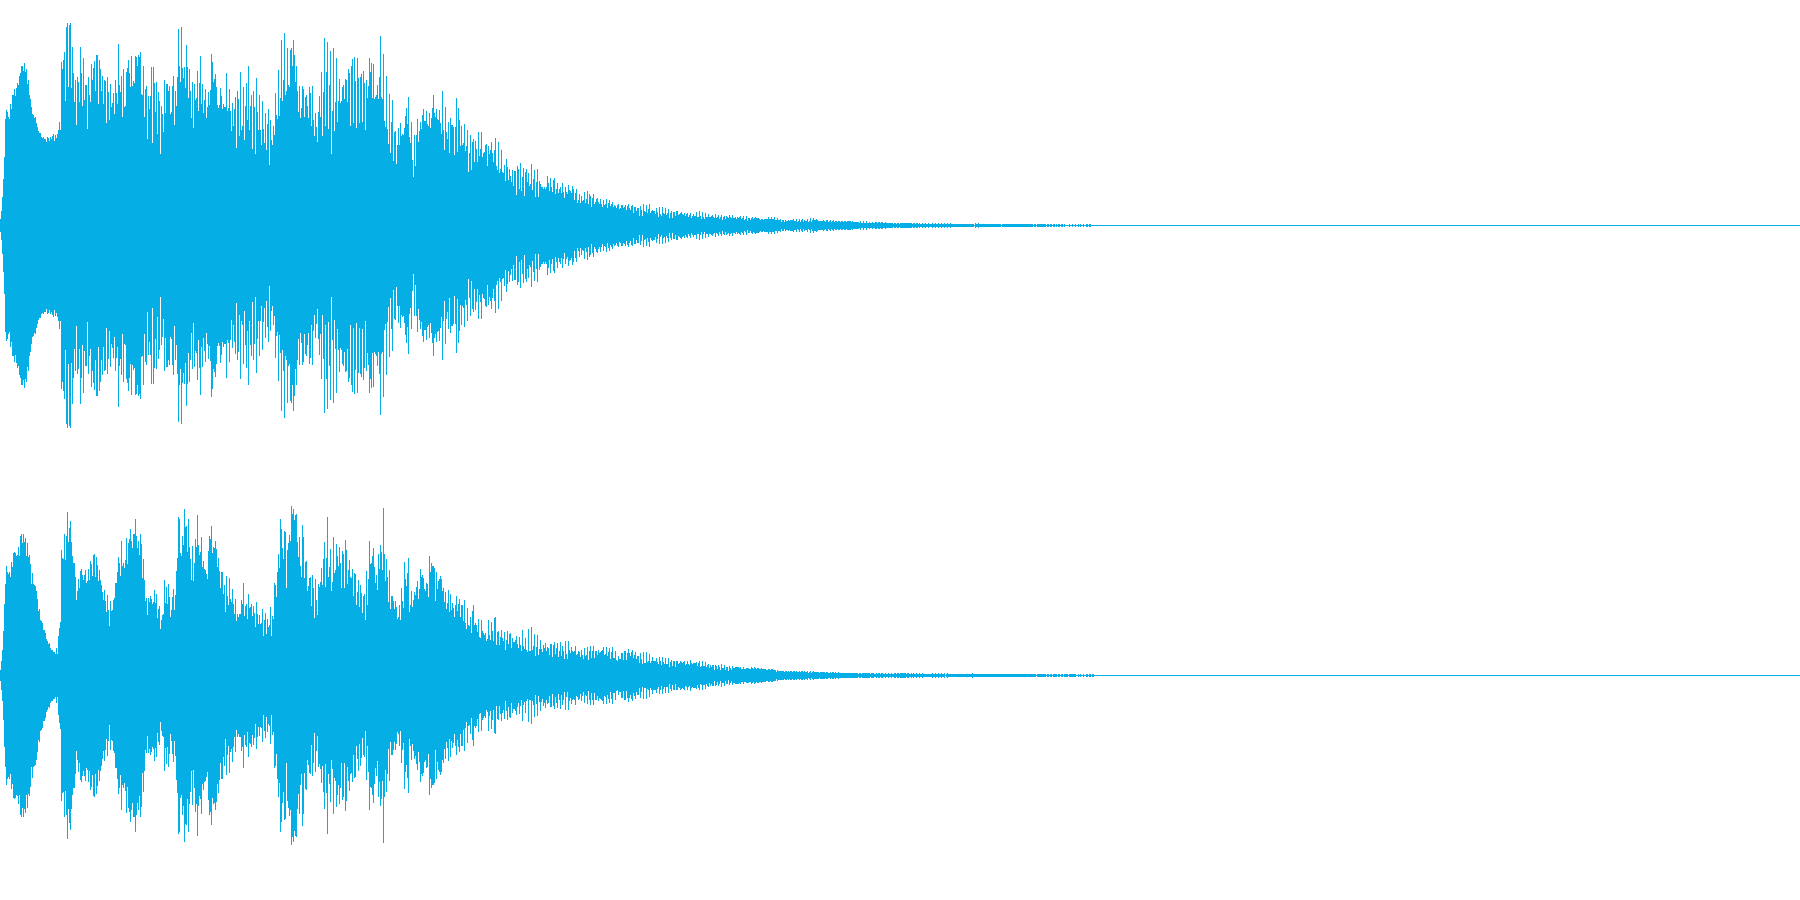 理科 化学 実験 変化 不思議 15の再生済みの波形